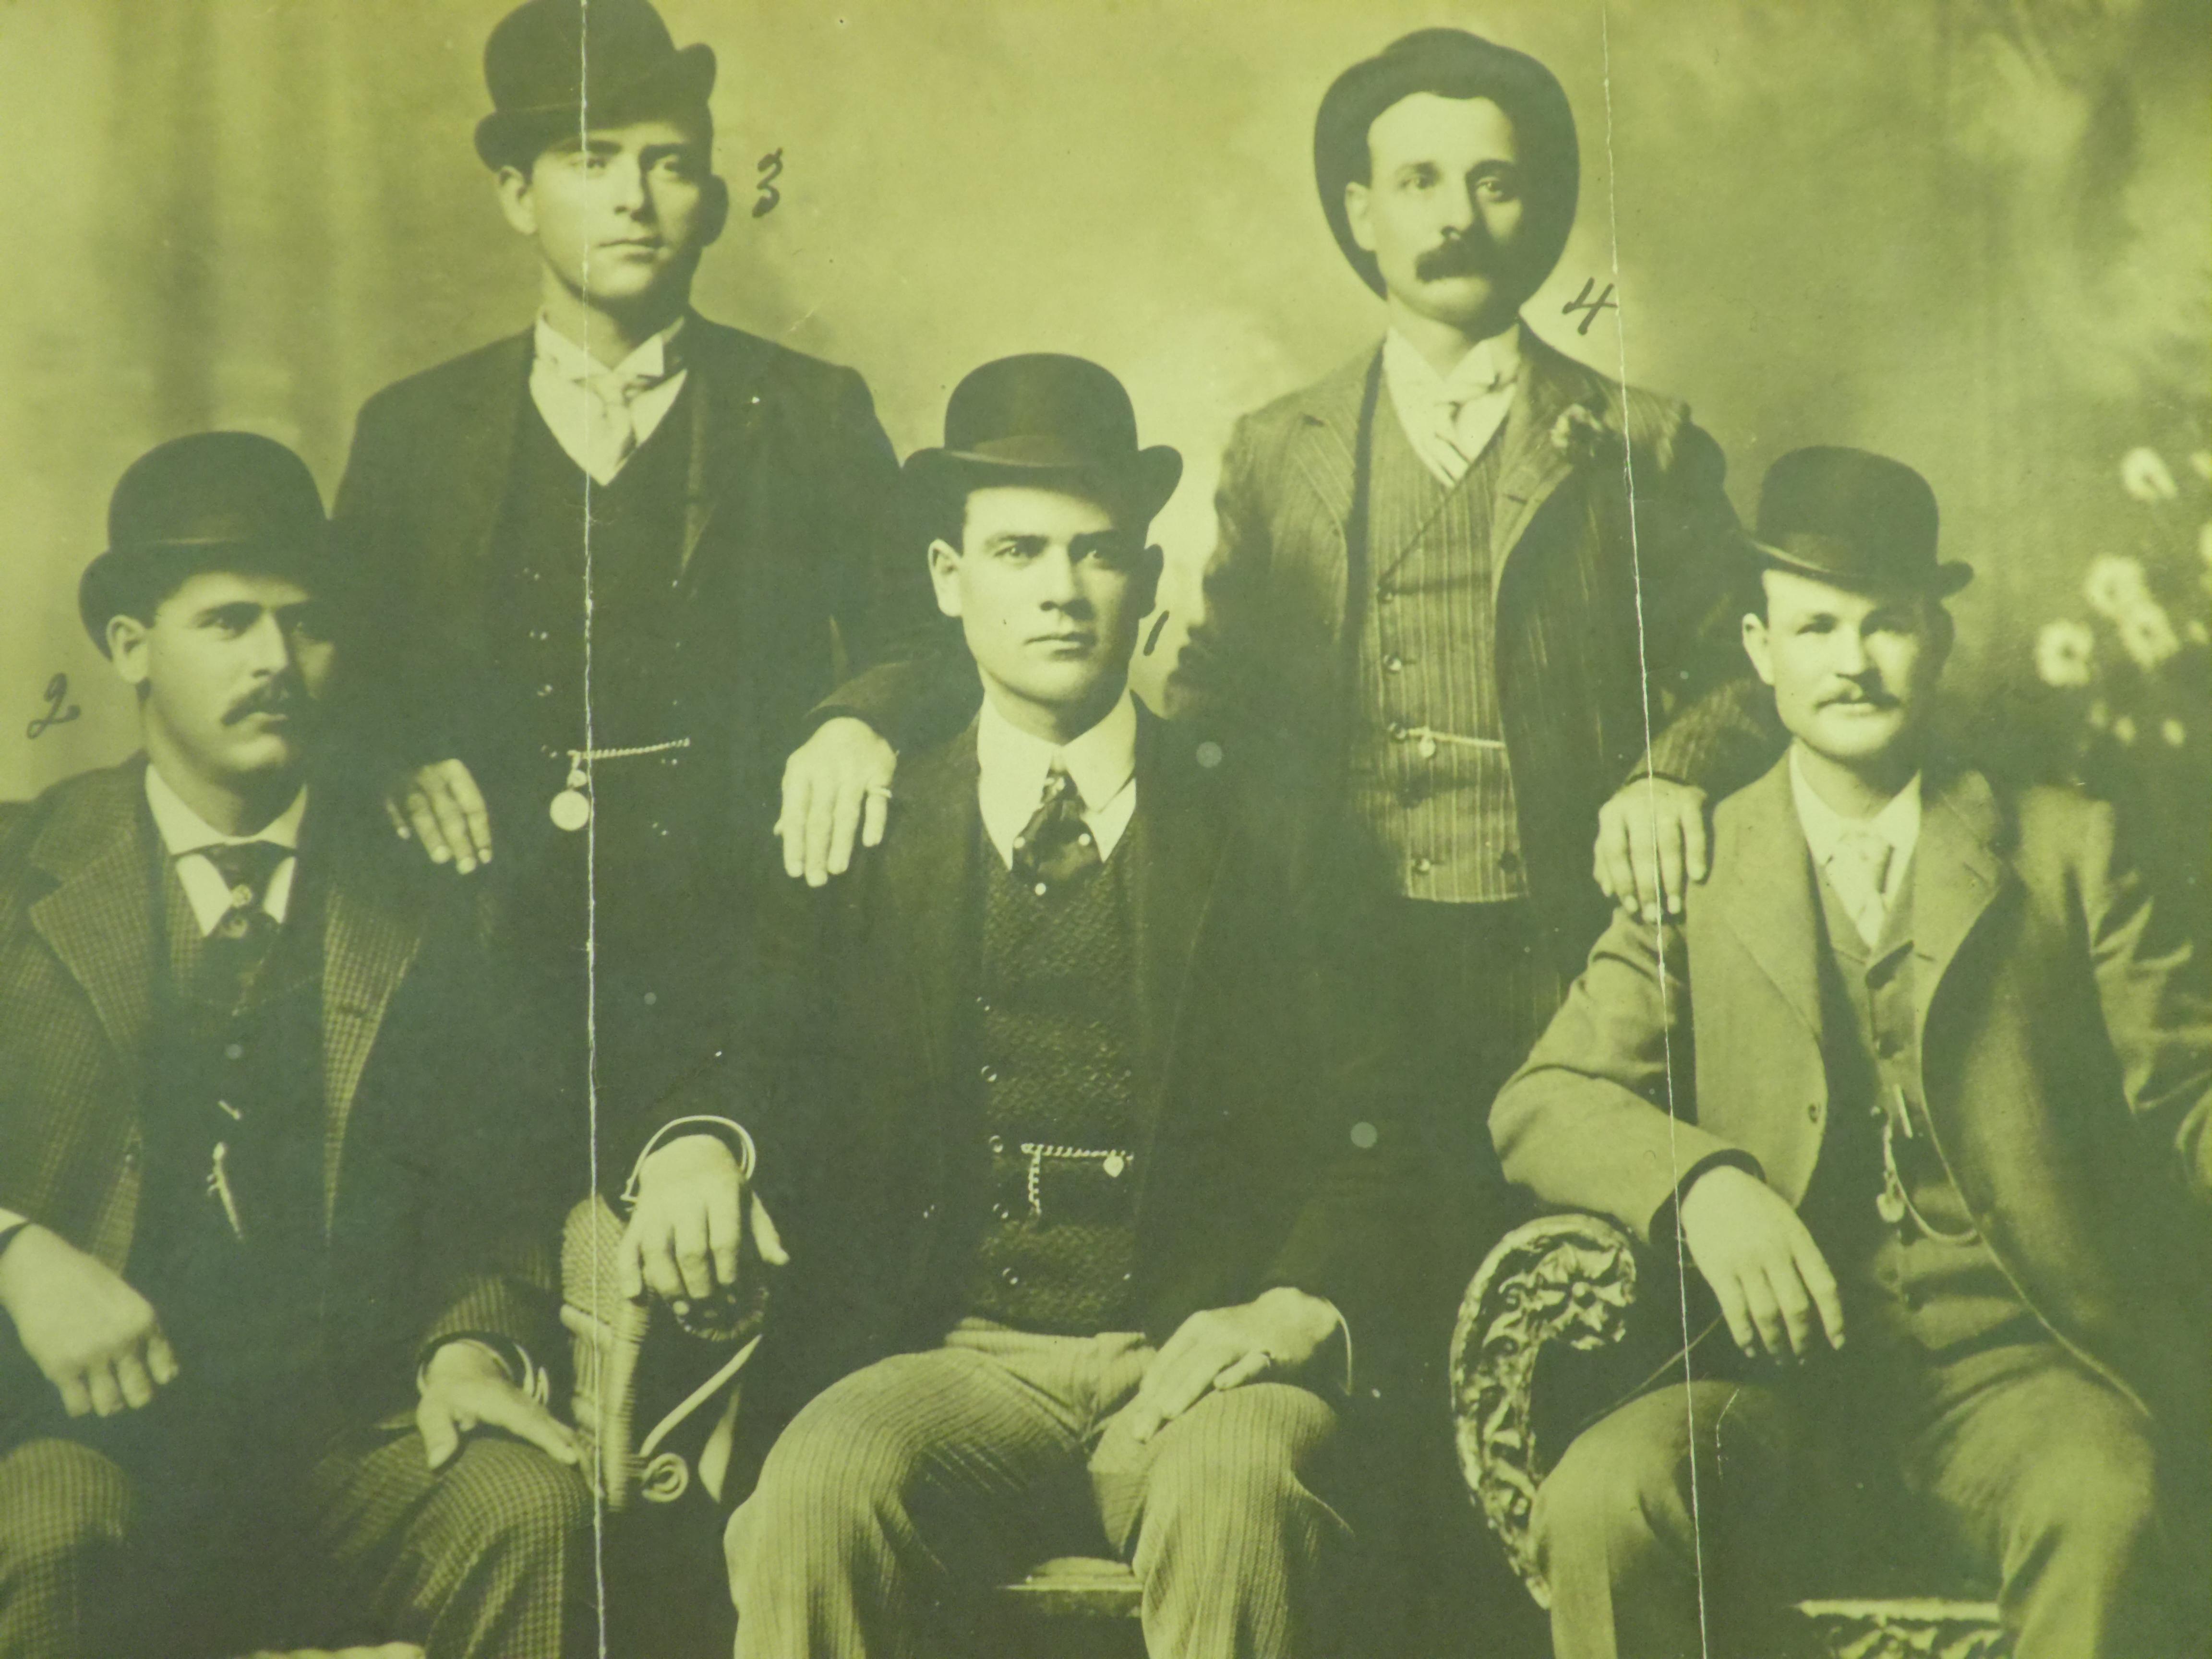 The Wild Bunch - circa 1900. Harry Alonzo Longabaugh - The Sundance